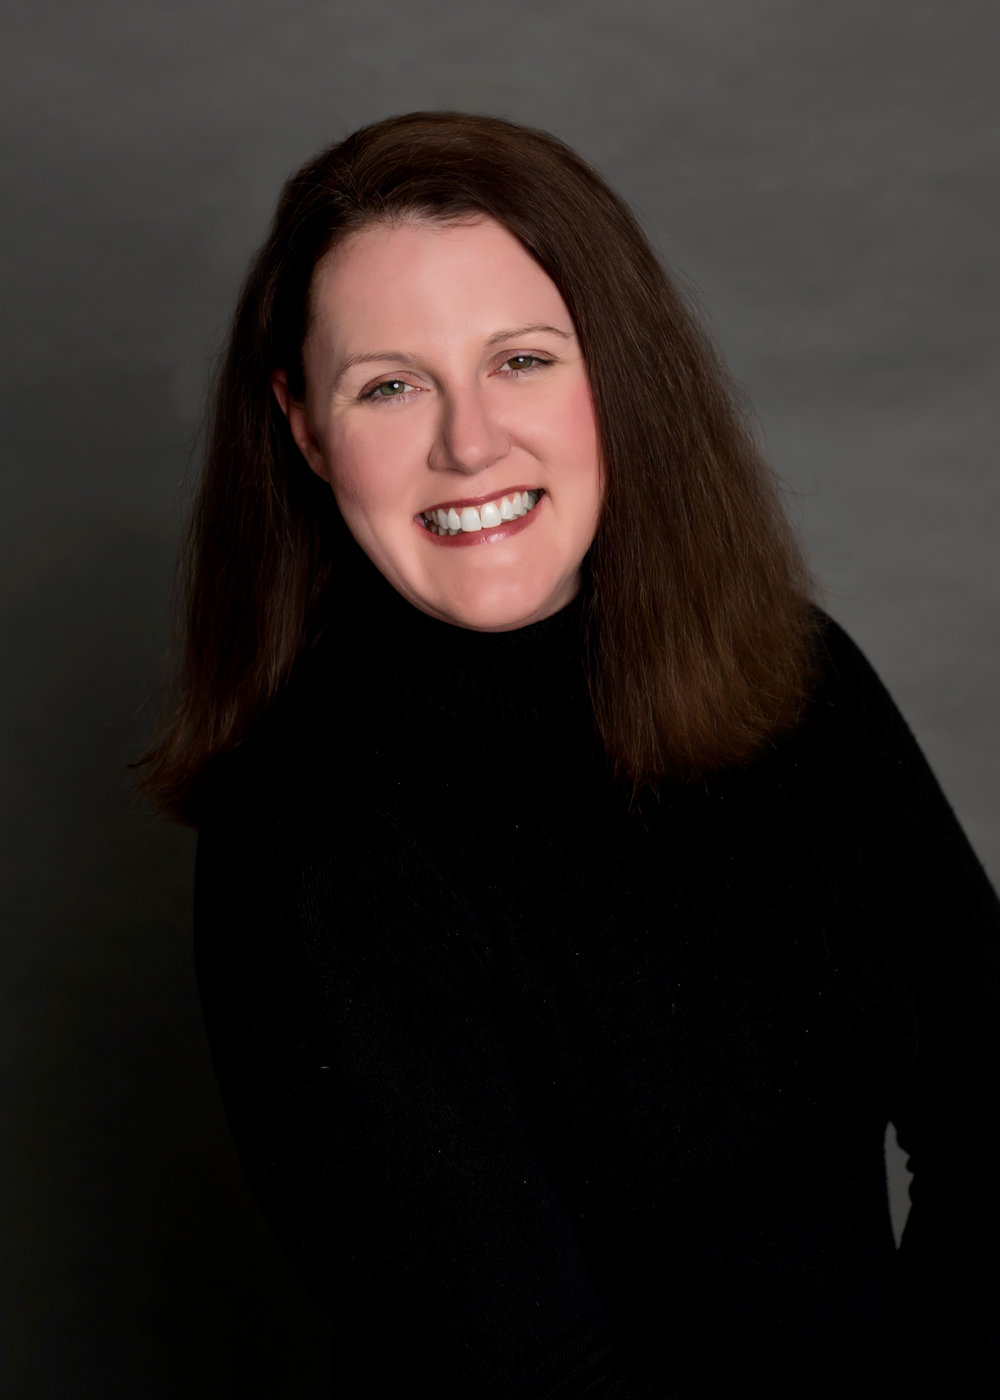 Courtney Bemo, Secretary